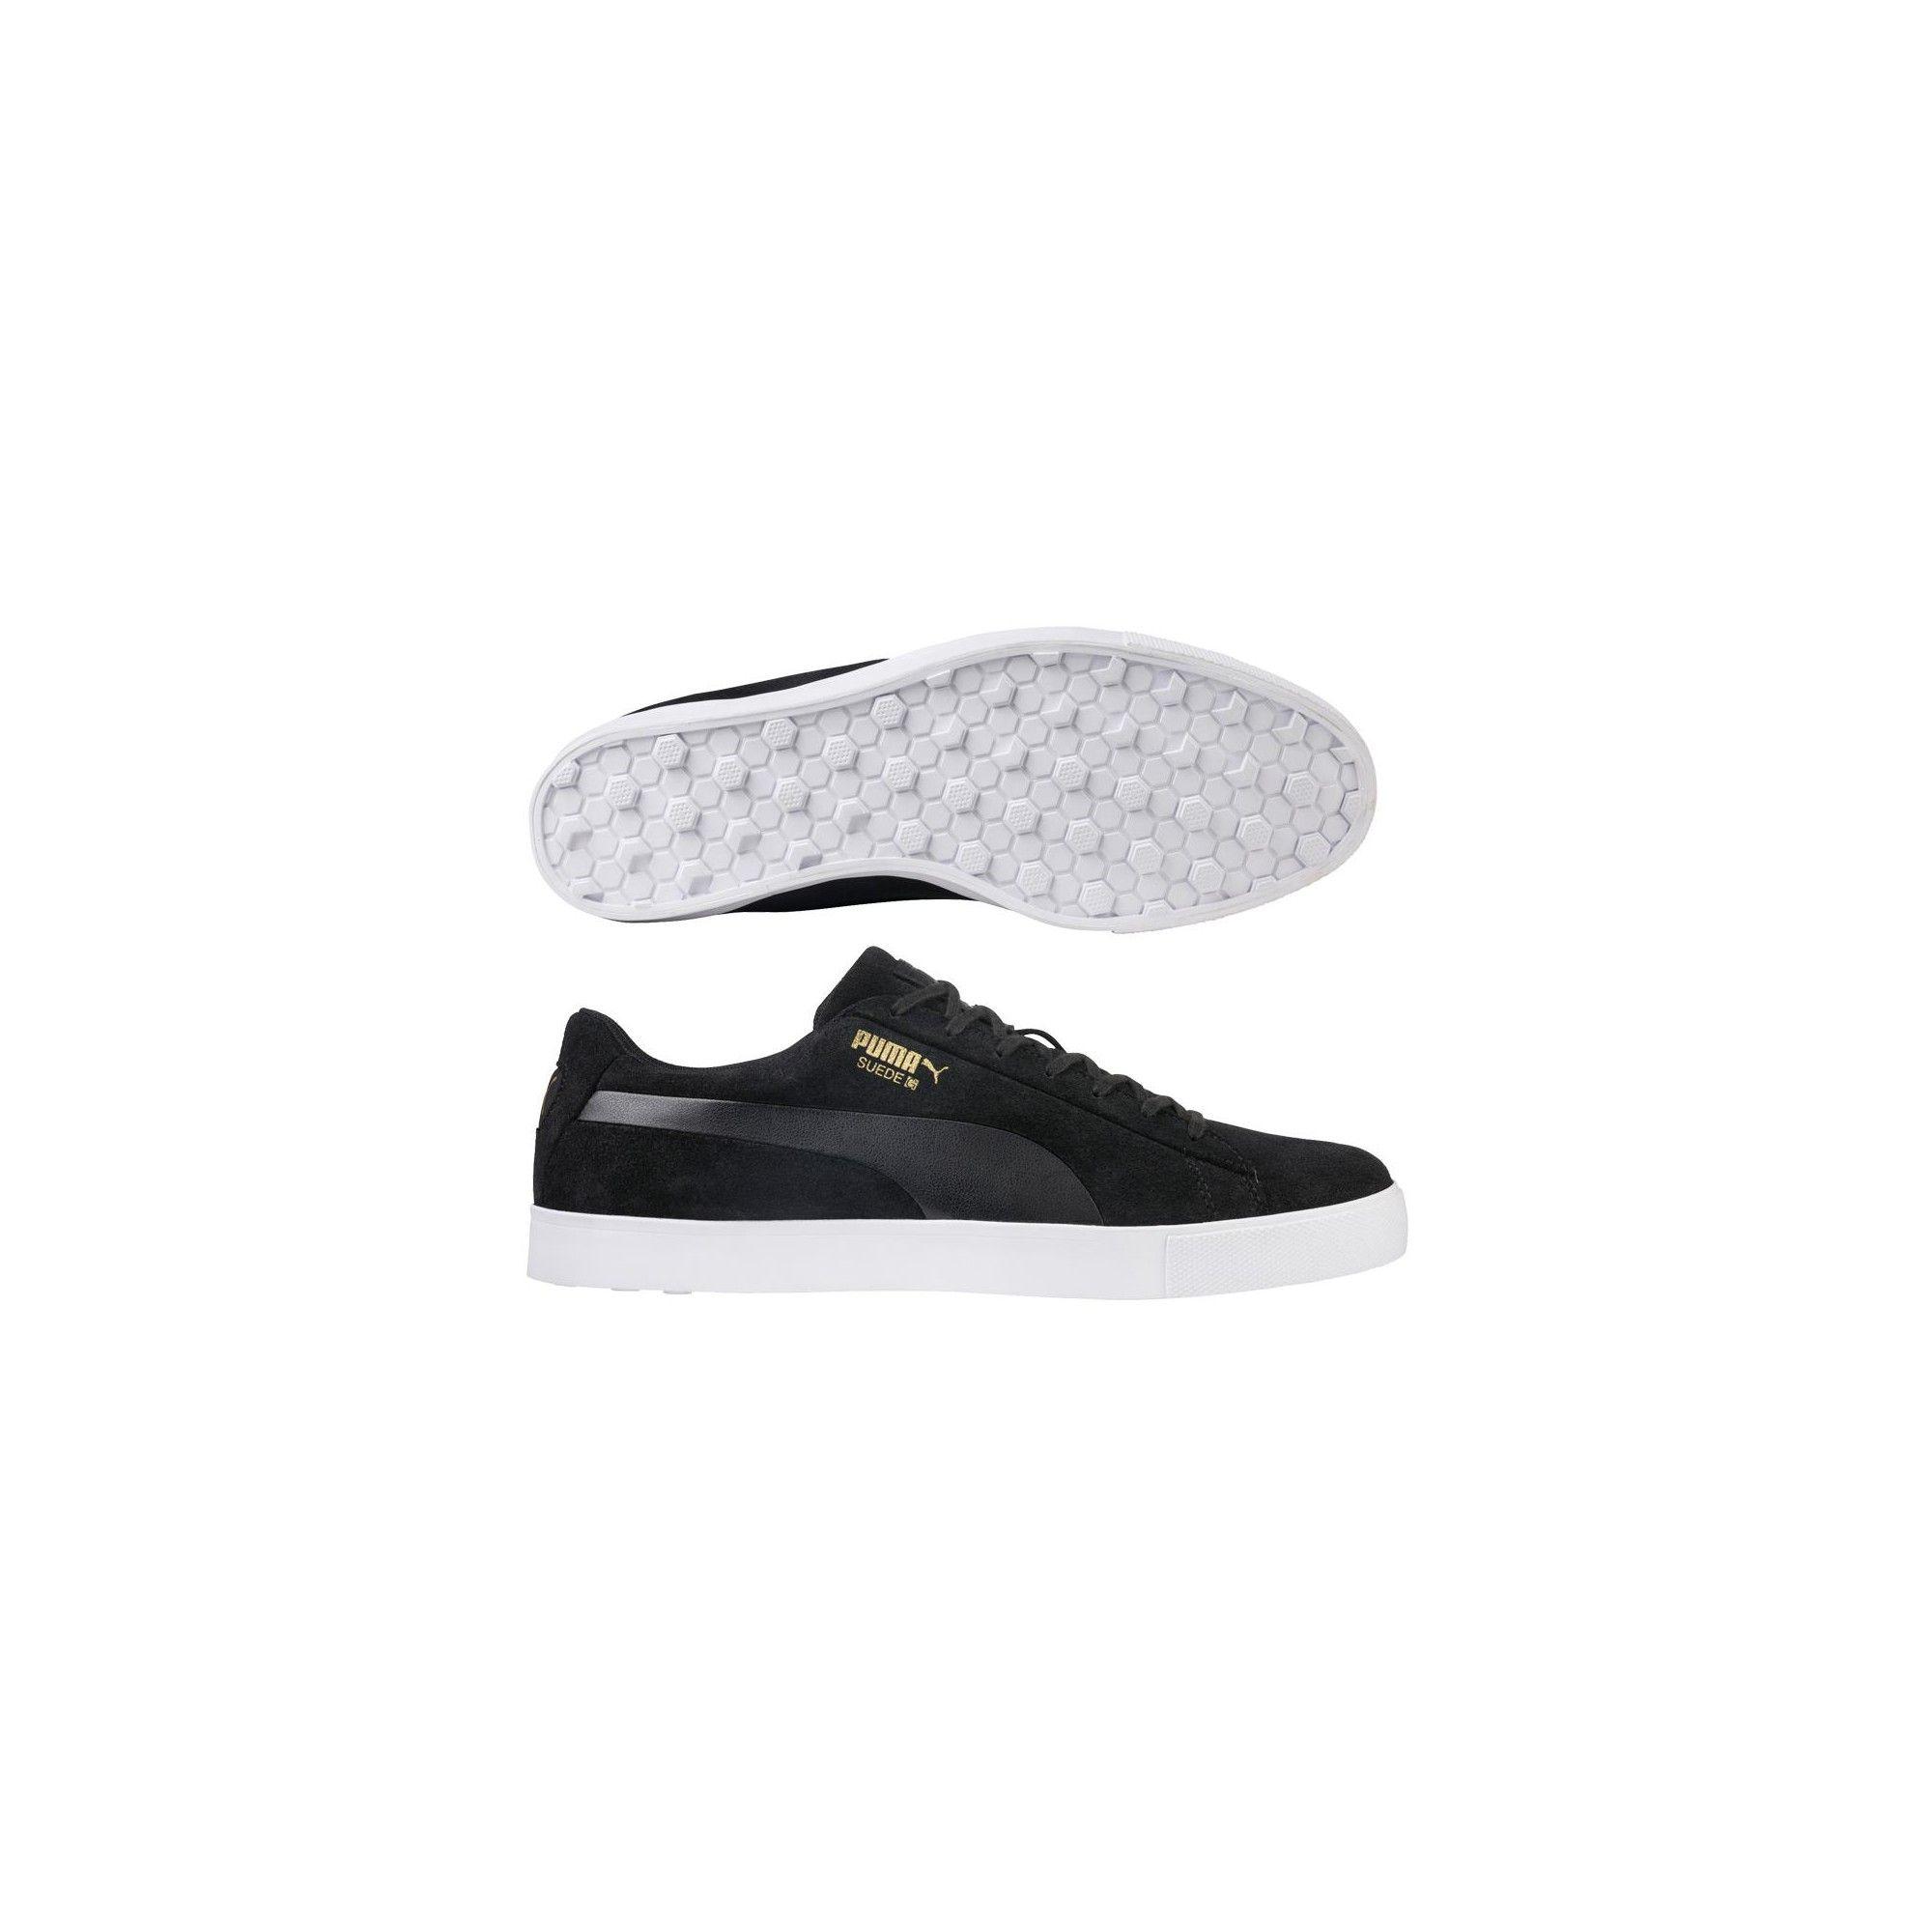 pretty nice a3845 254b8 Men's Puma Suede G Spikeless Golf Shoes Black 11.5 Medium ...